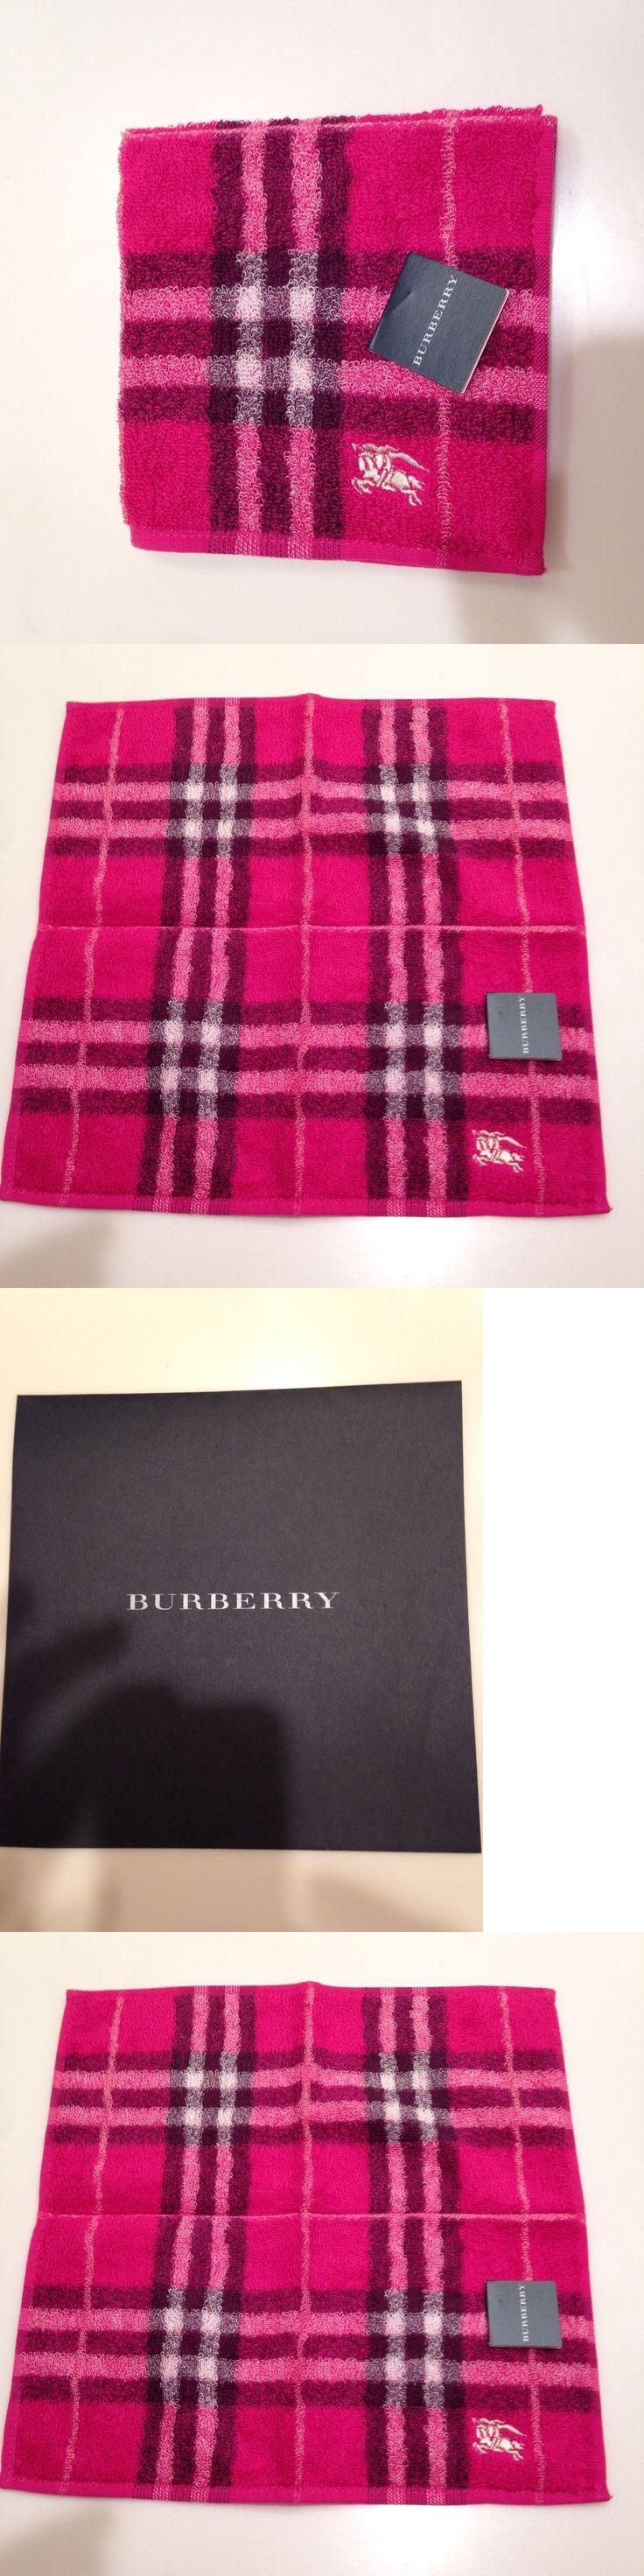 Handkerchiefs 167906: Nwt Authentic Burberry Purse Hand Towel, Pocket Towel, Baby Towel, Fuschia -> BUY IT NOW ONLY: $49.7 on eBay!